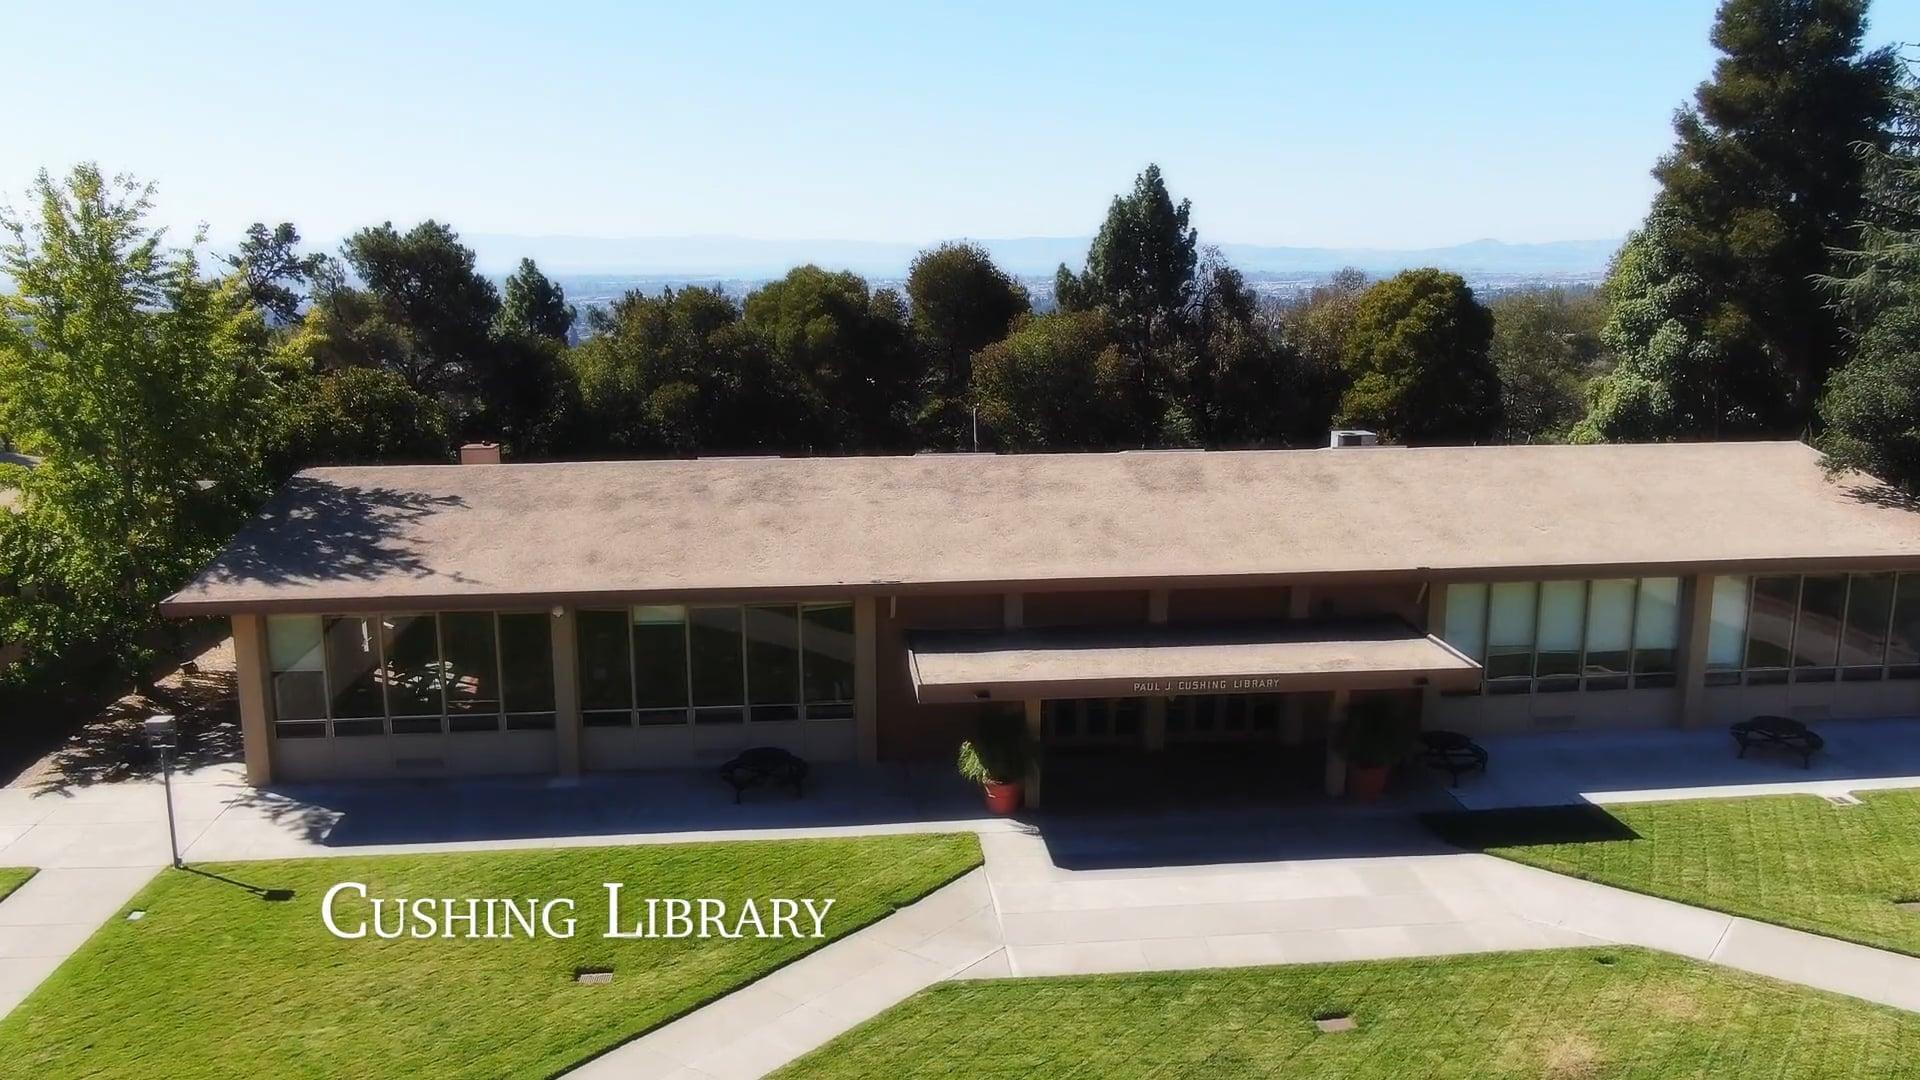 Cushing Library_Campus Tour.mov